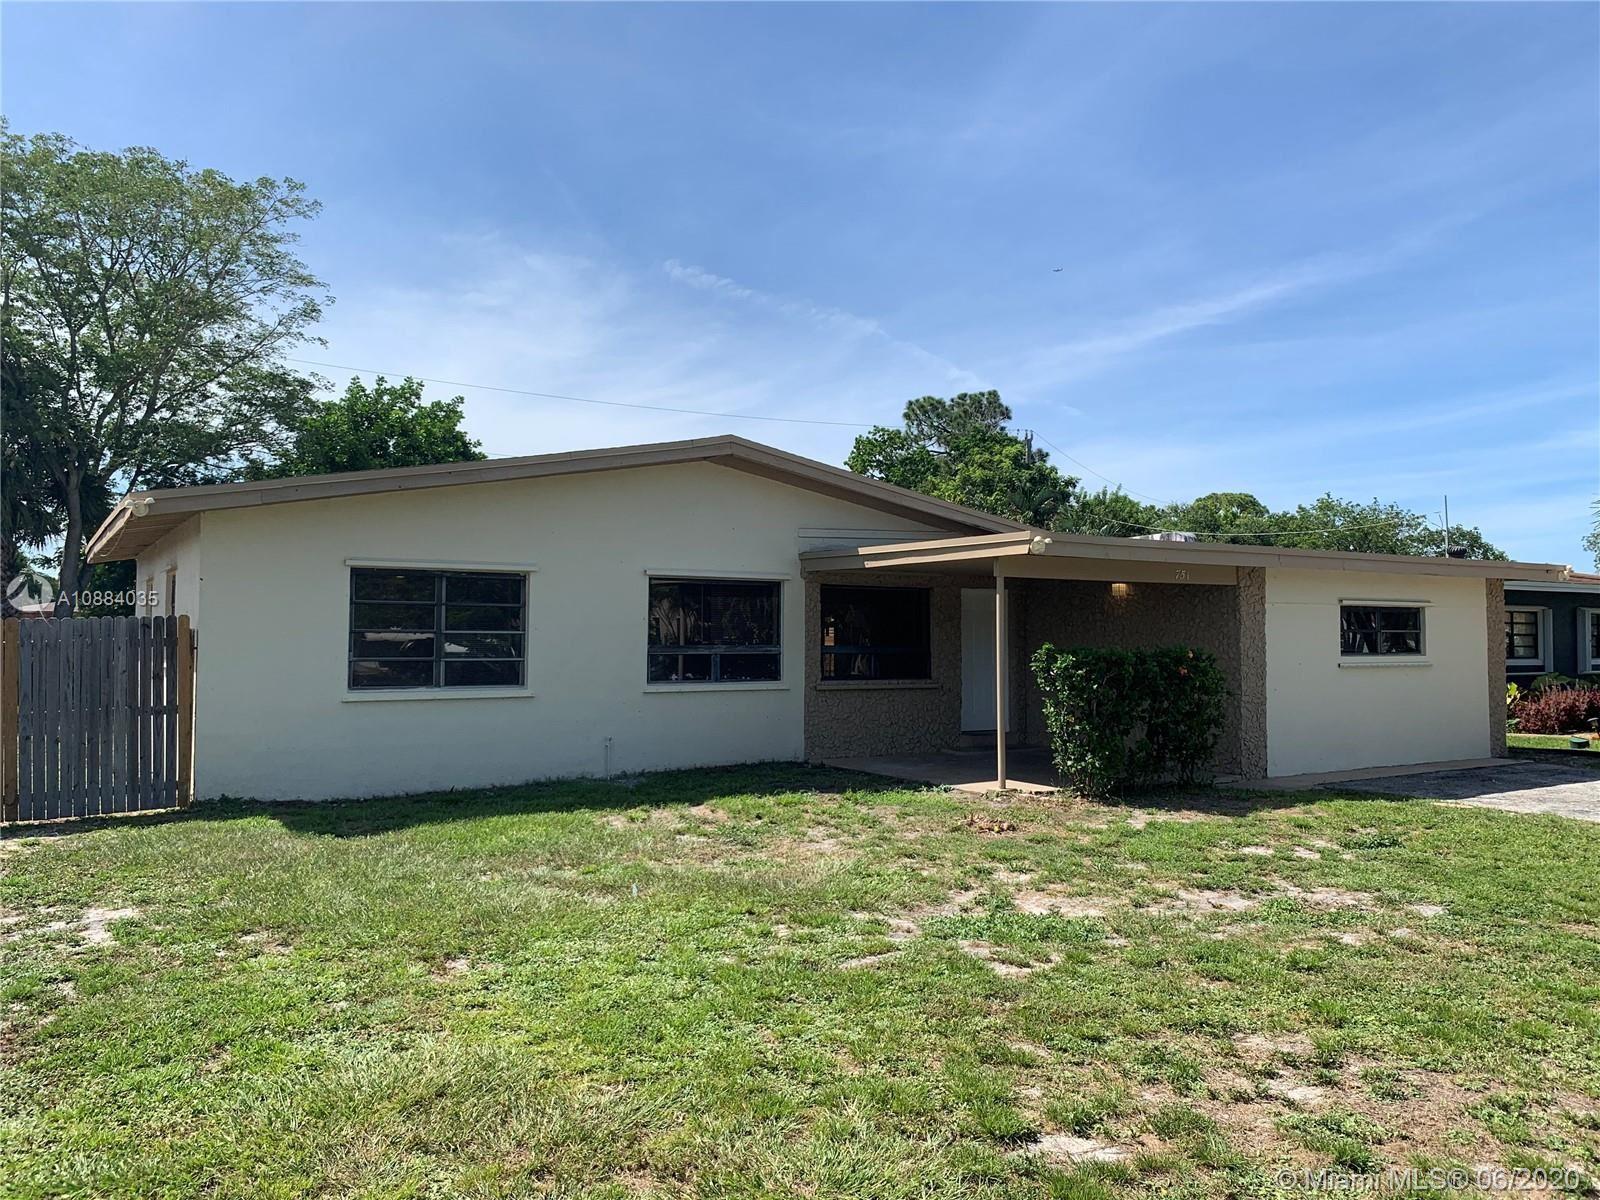 751 Carolina Ave, Fort Lauderdale, FL 33312 - #: A10884035